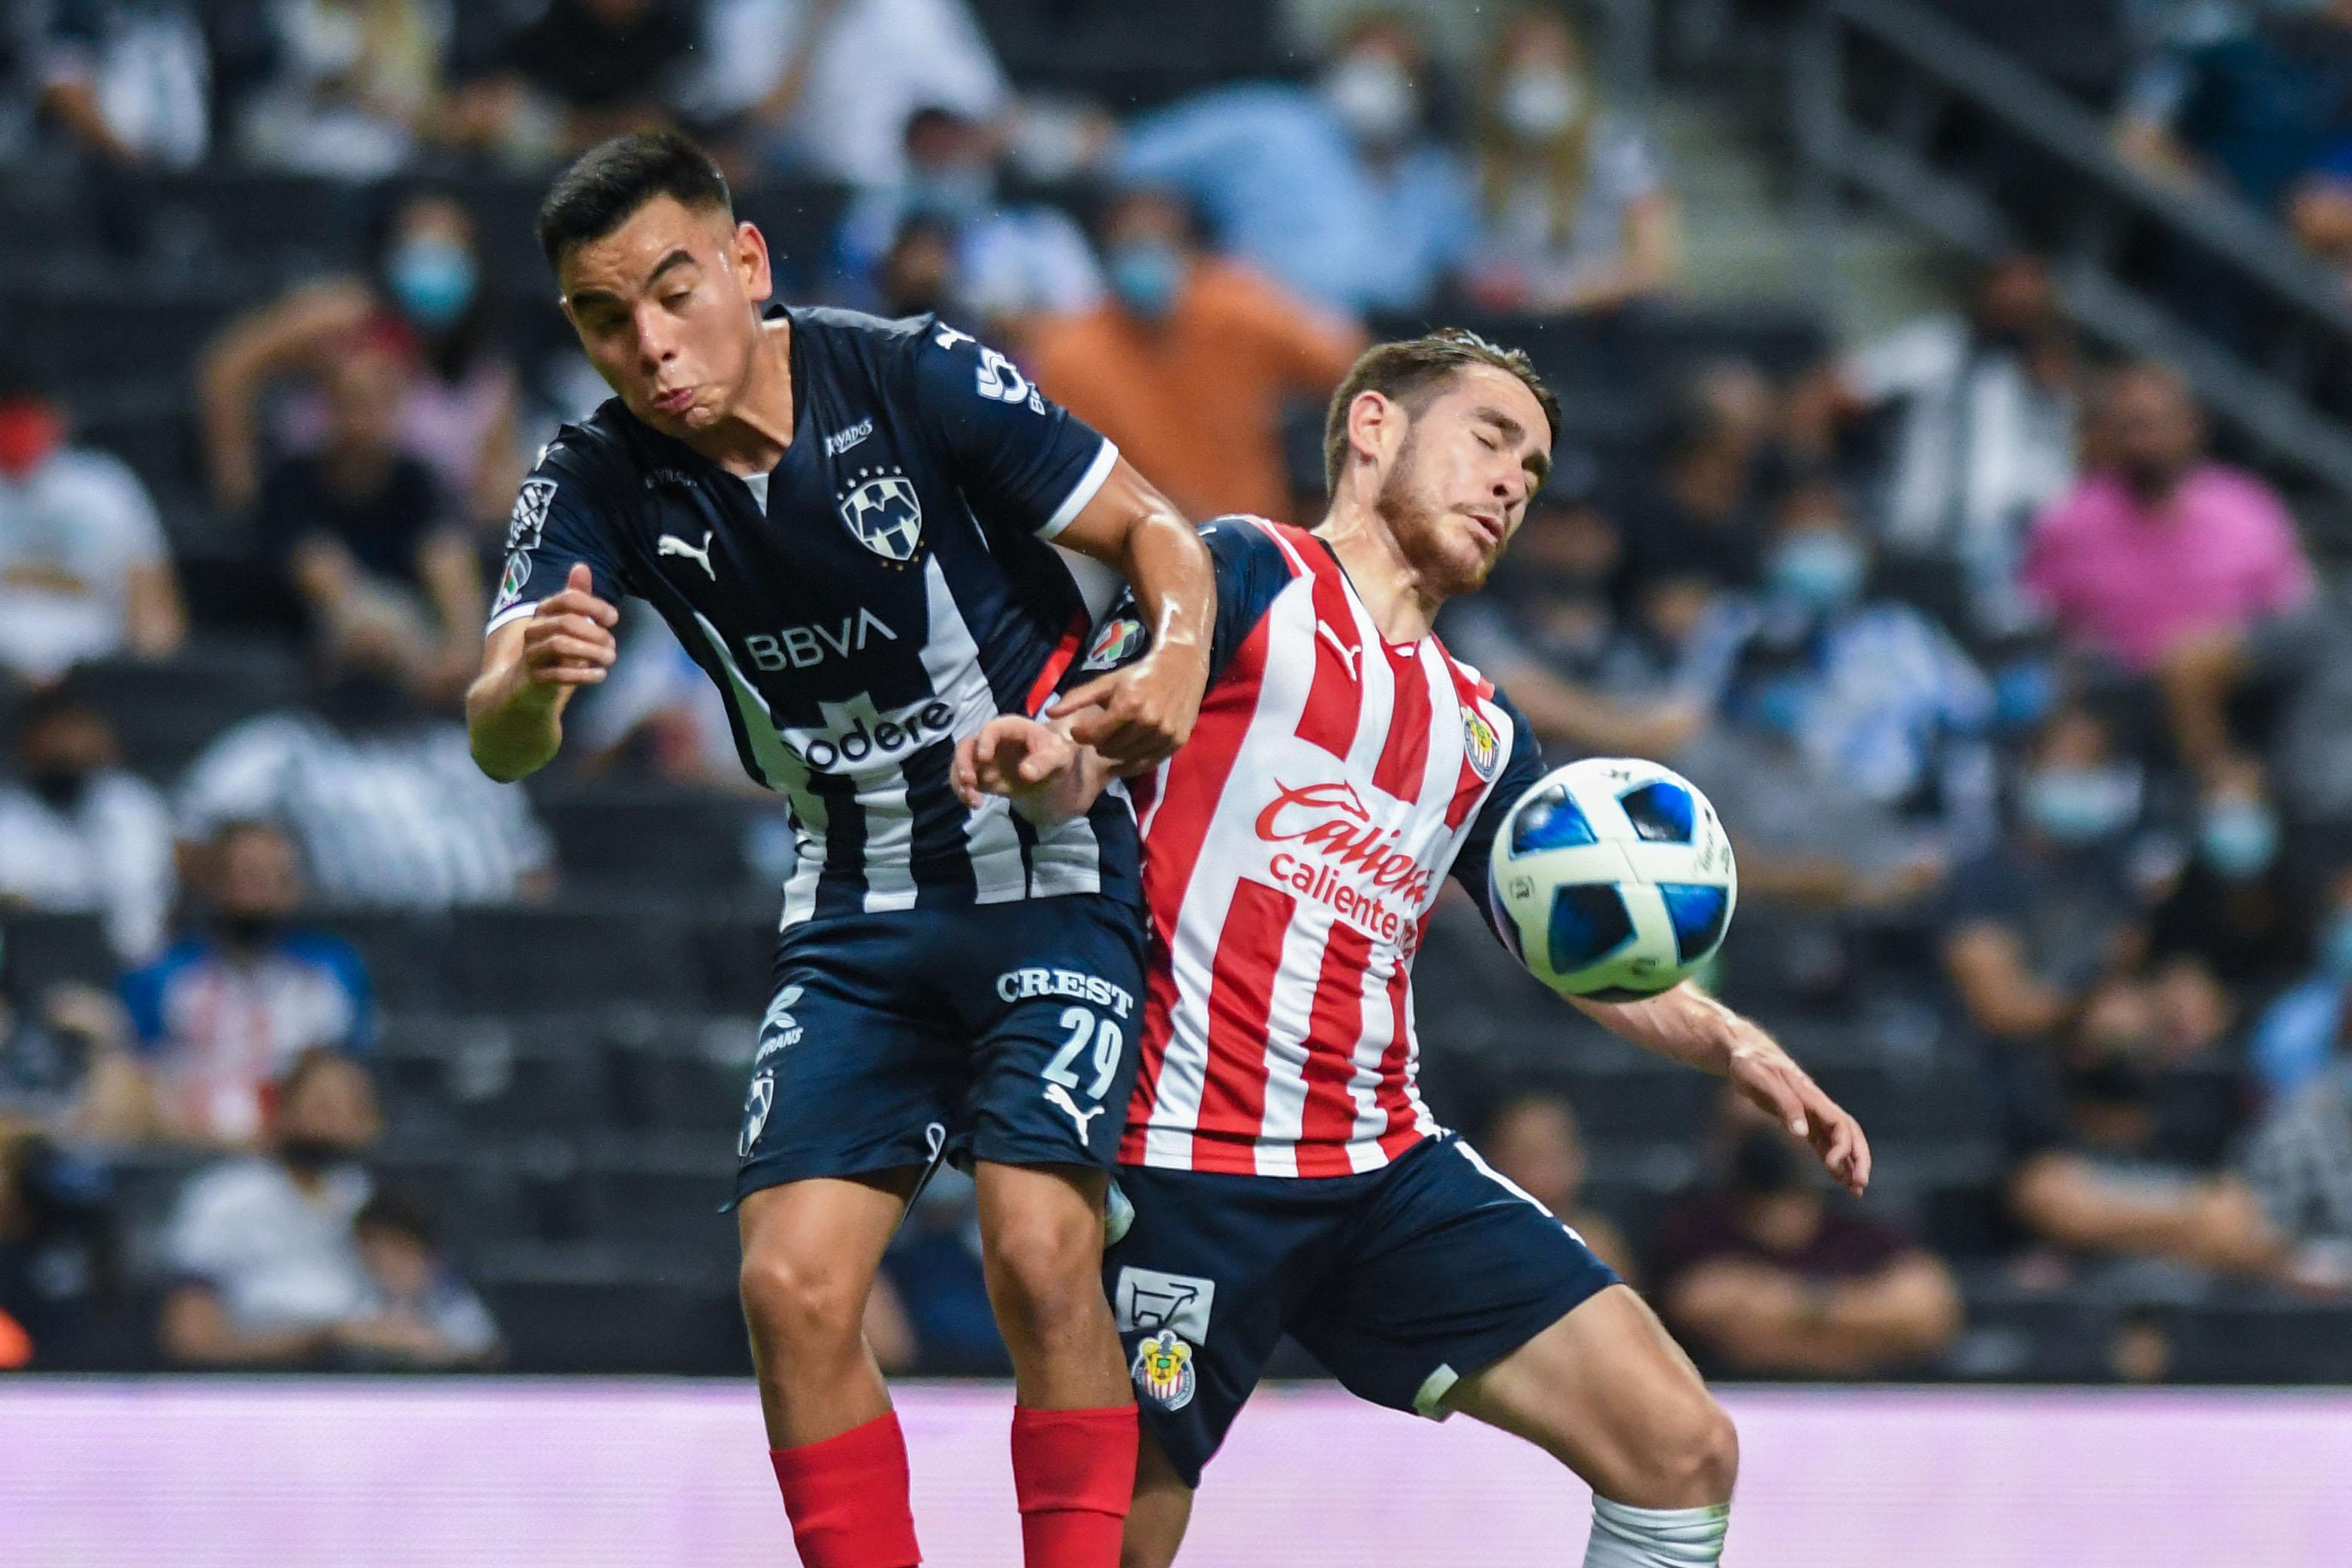 Monterrey vs Chivas 0-0 Torneo Apertura 2021